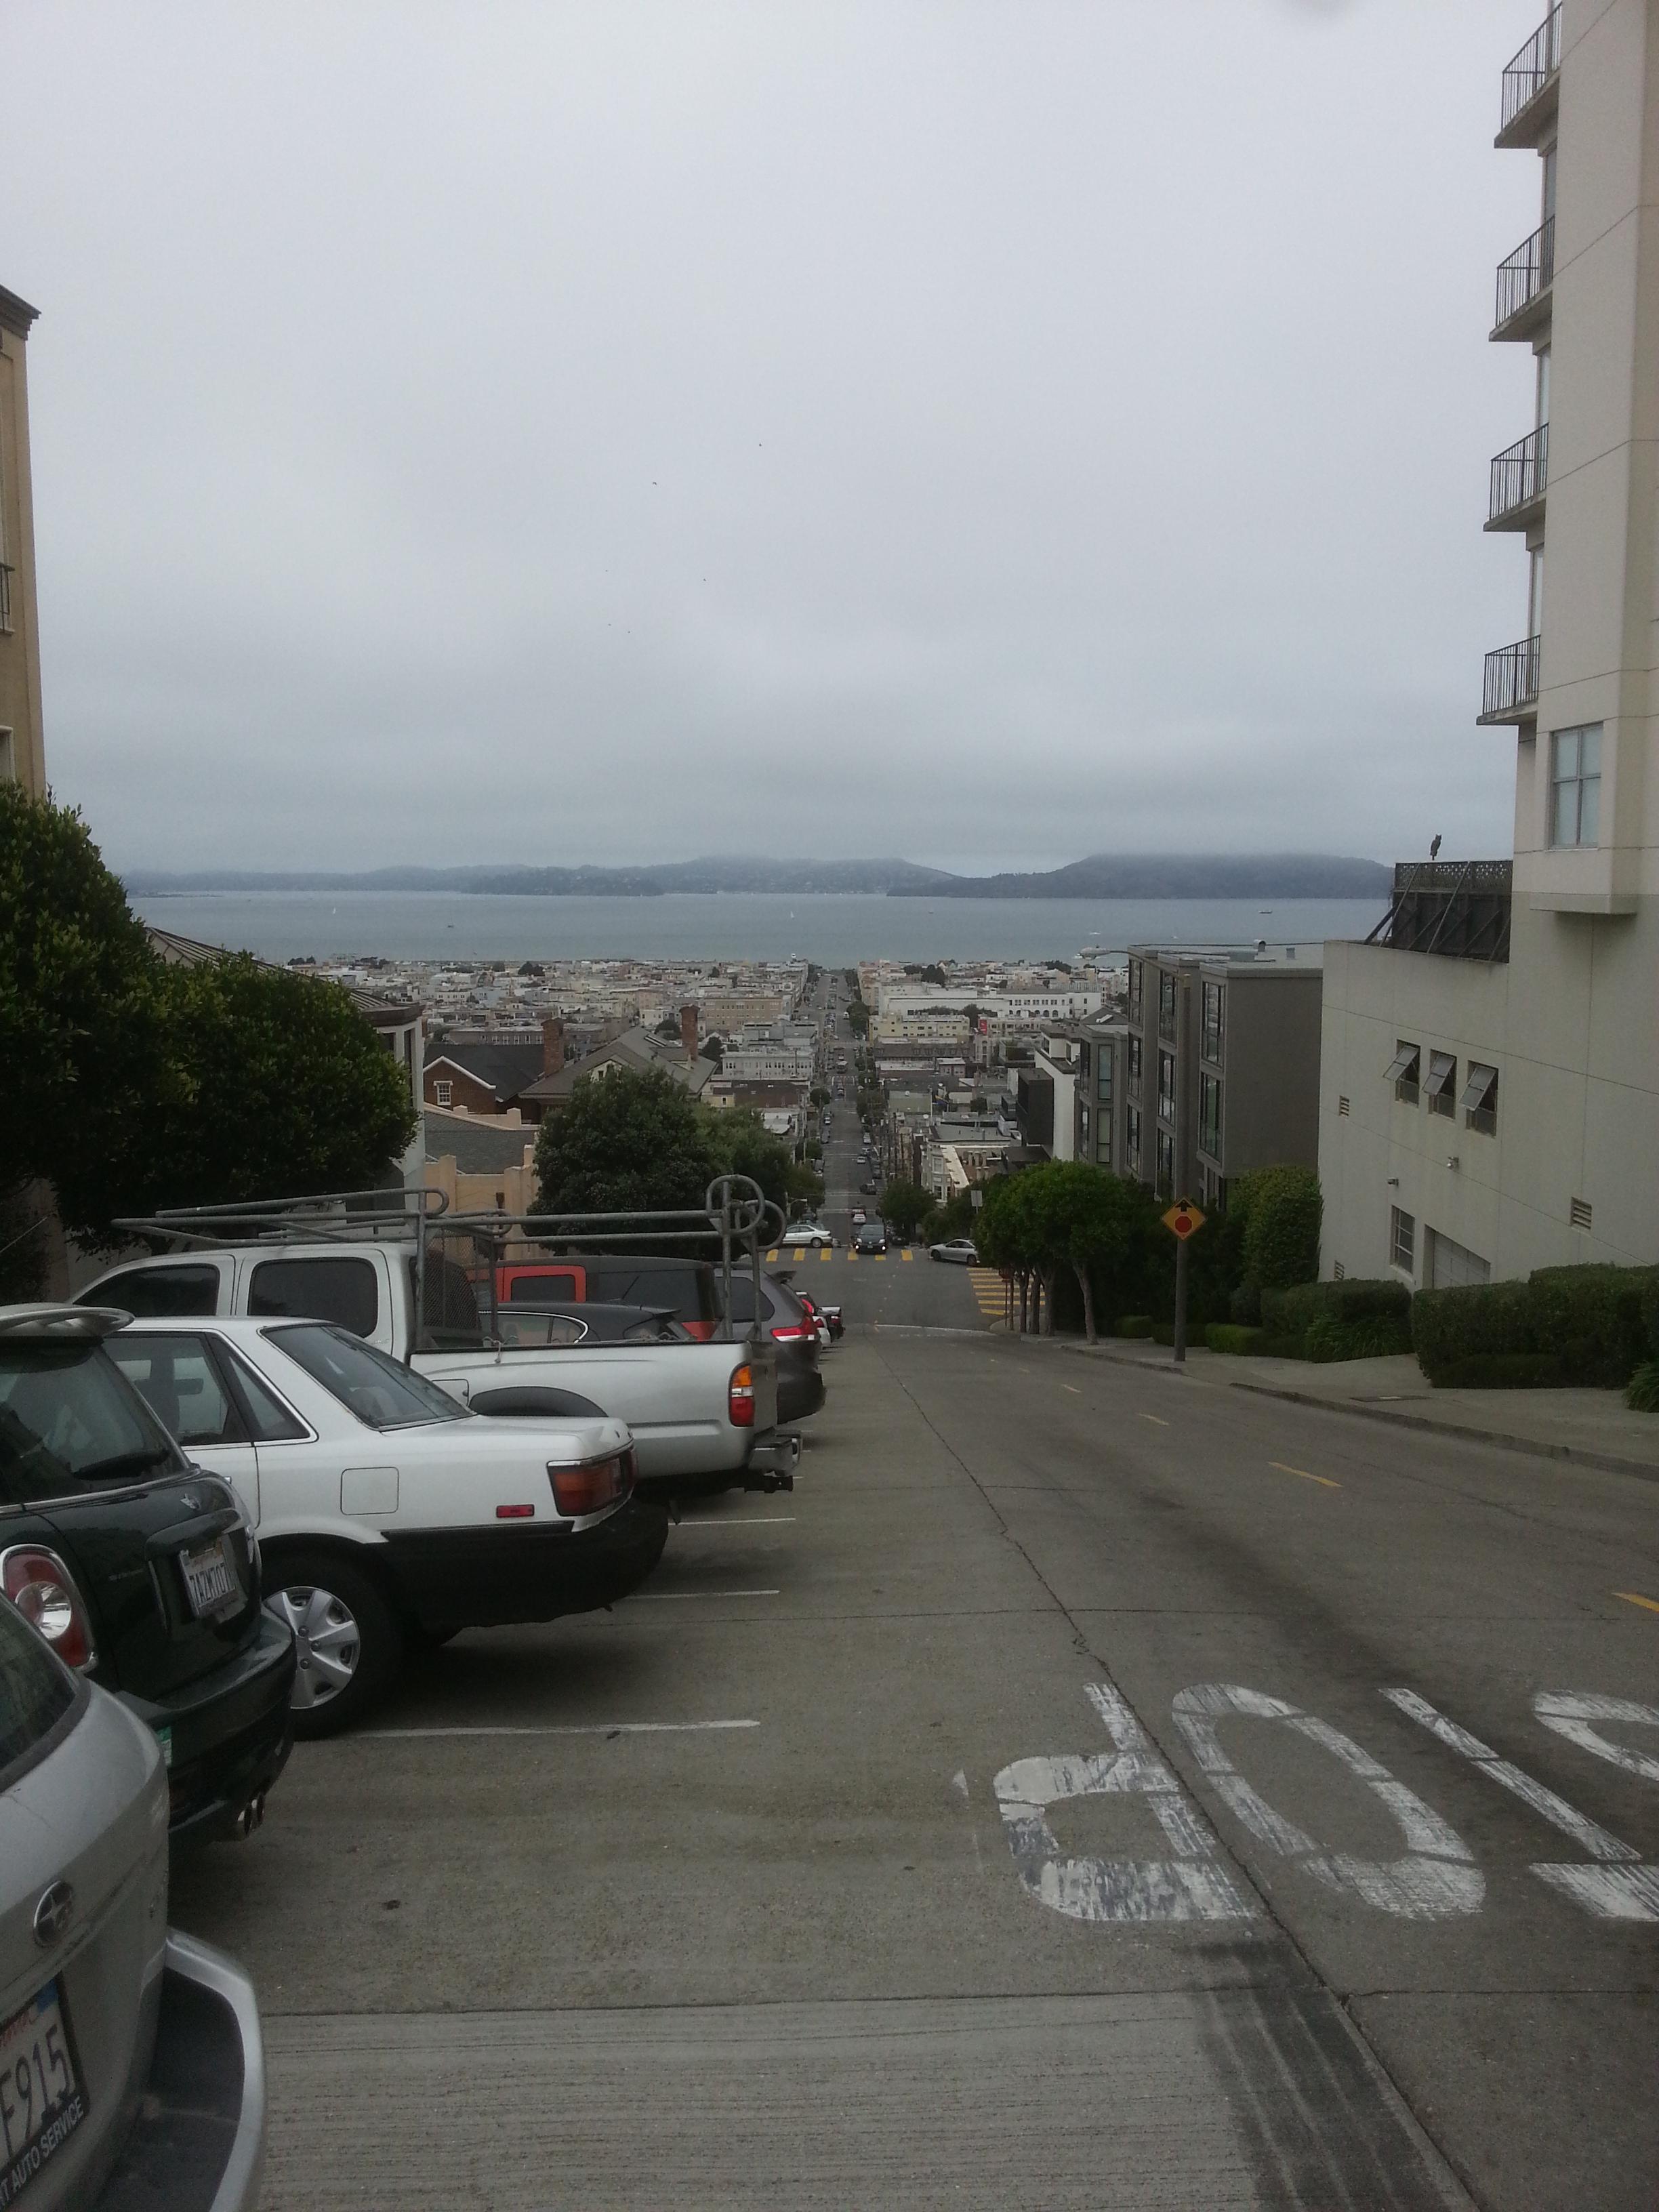 long, steep street